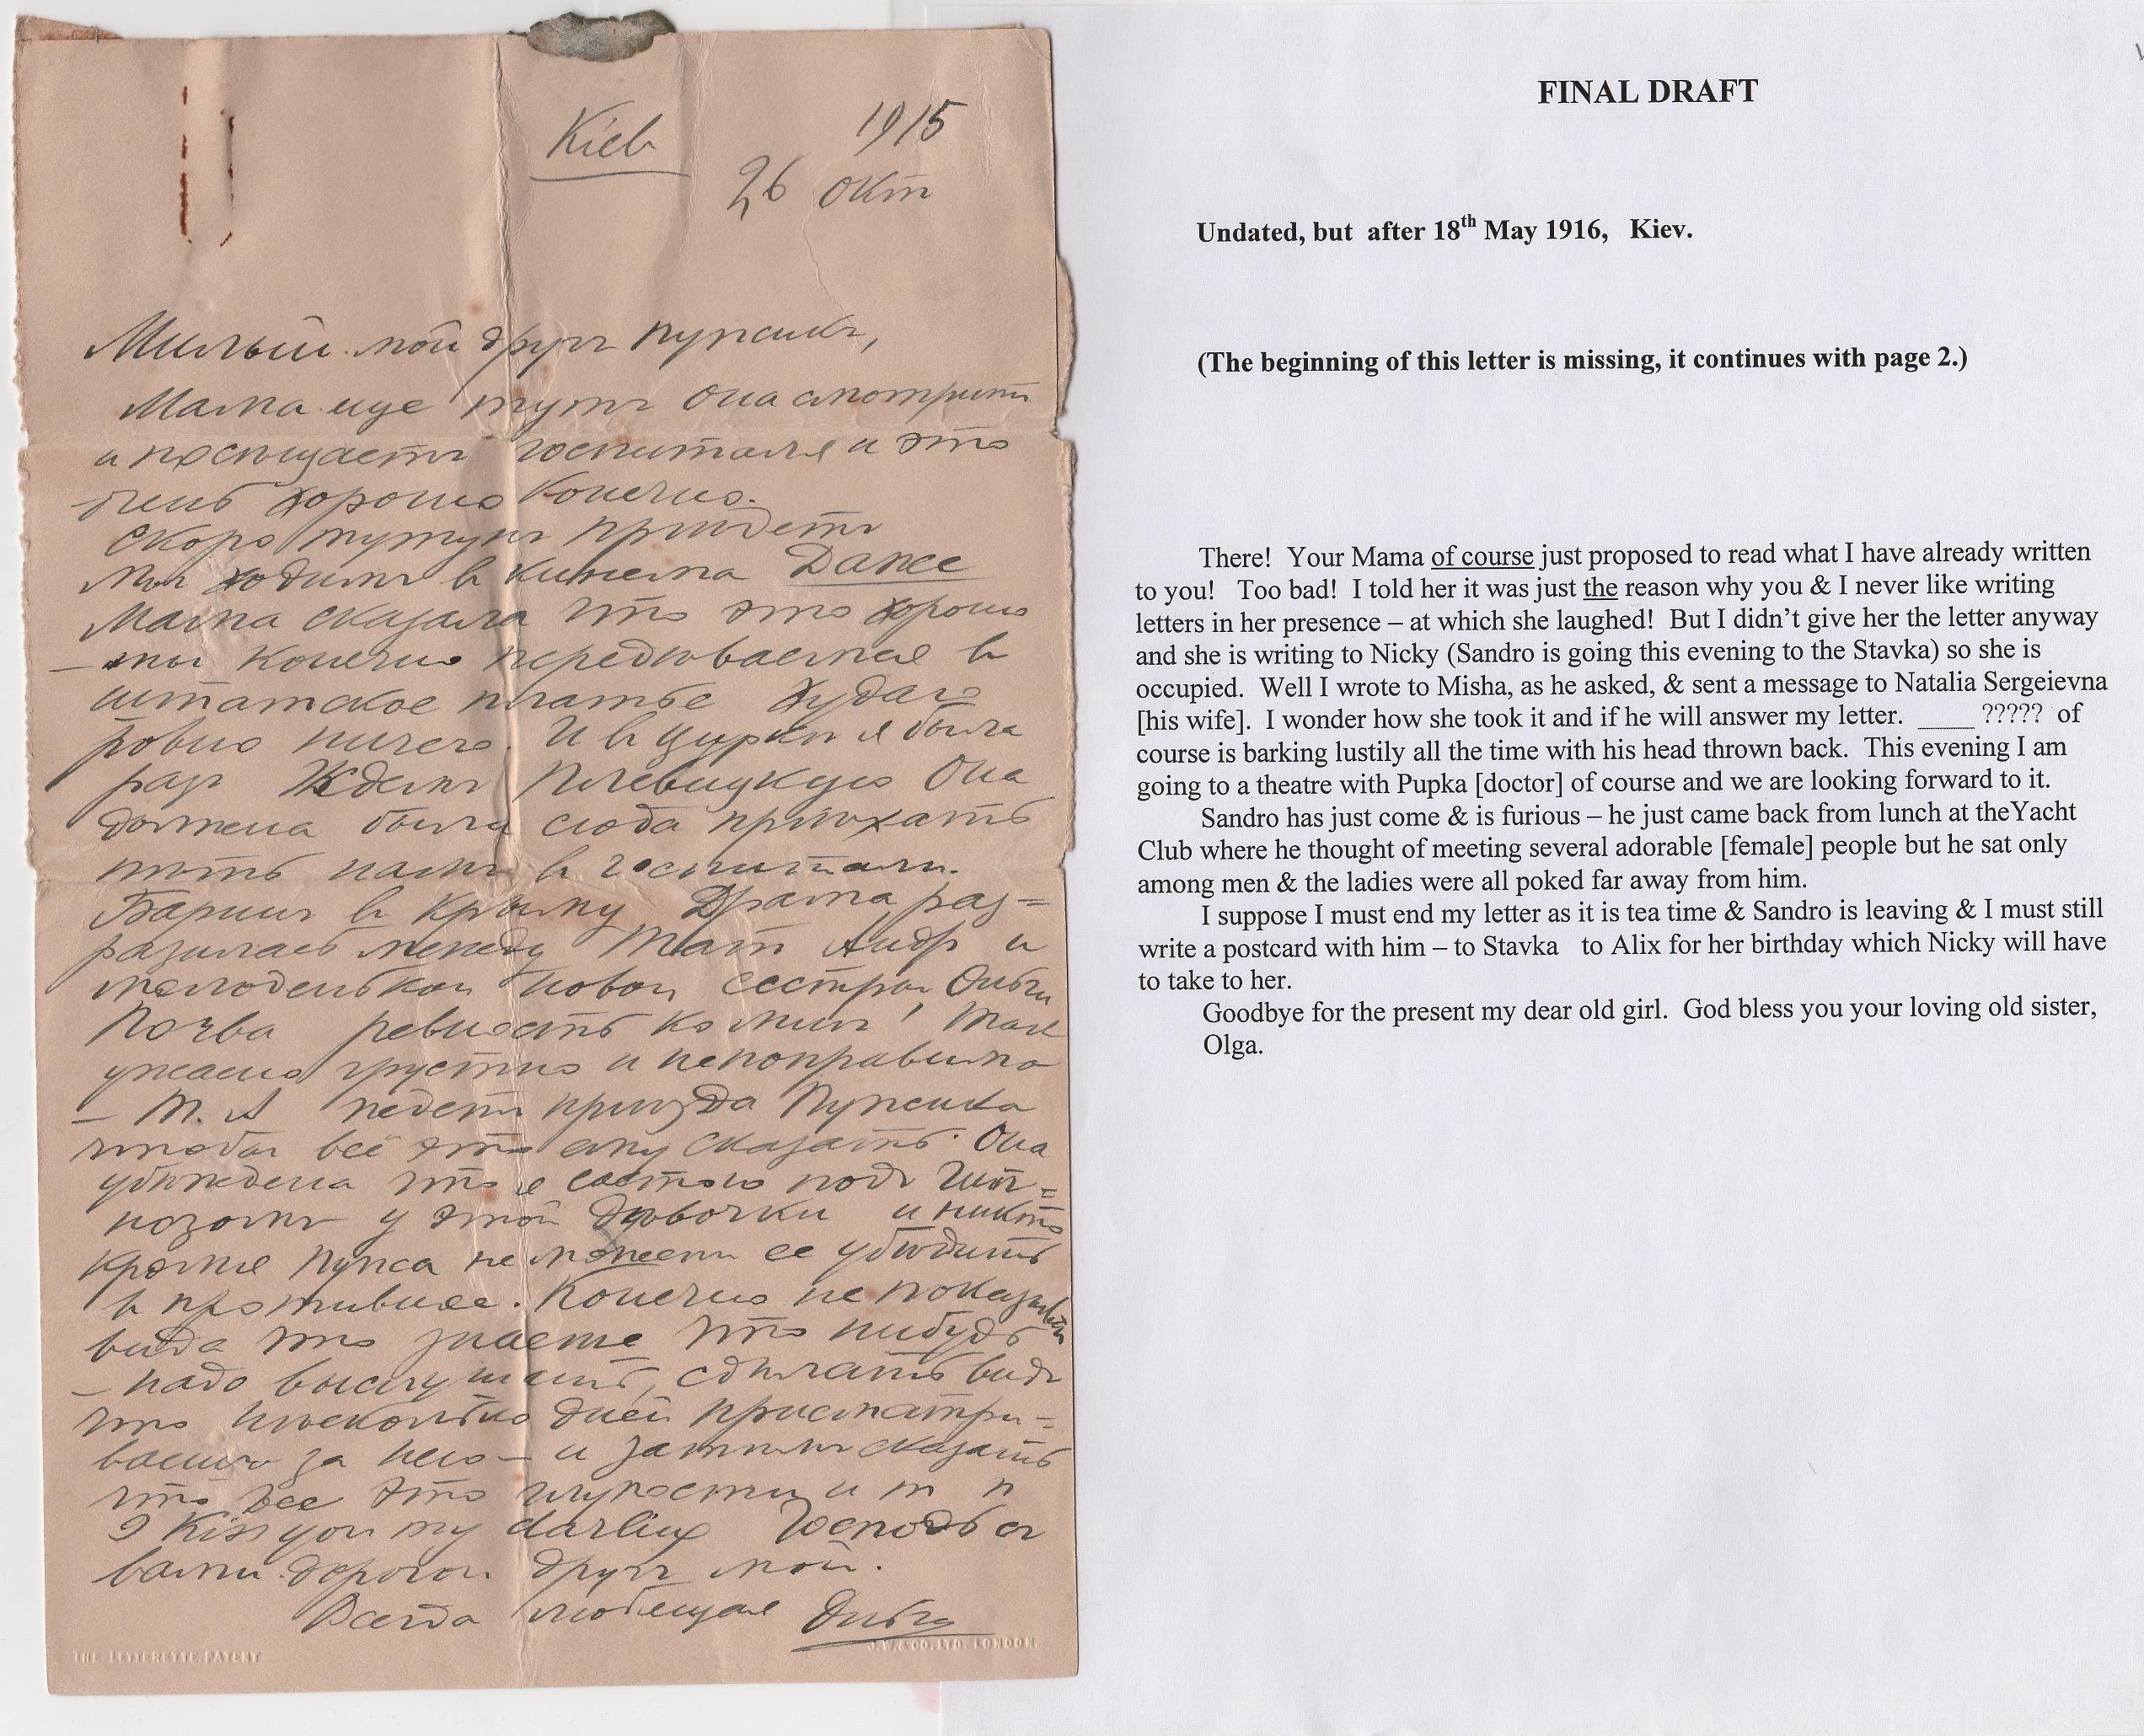 Royalty Grand Duchess Olga Correspondence To Her Sister Grand Duchess Xenia 1916-1920 - Image 47 of 47